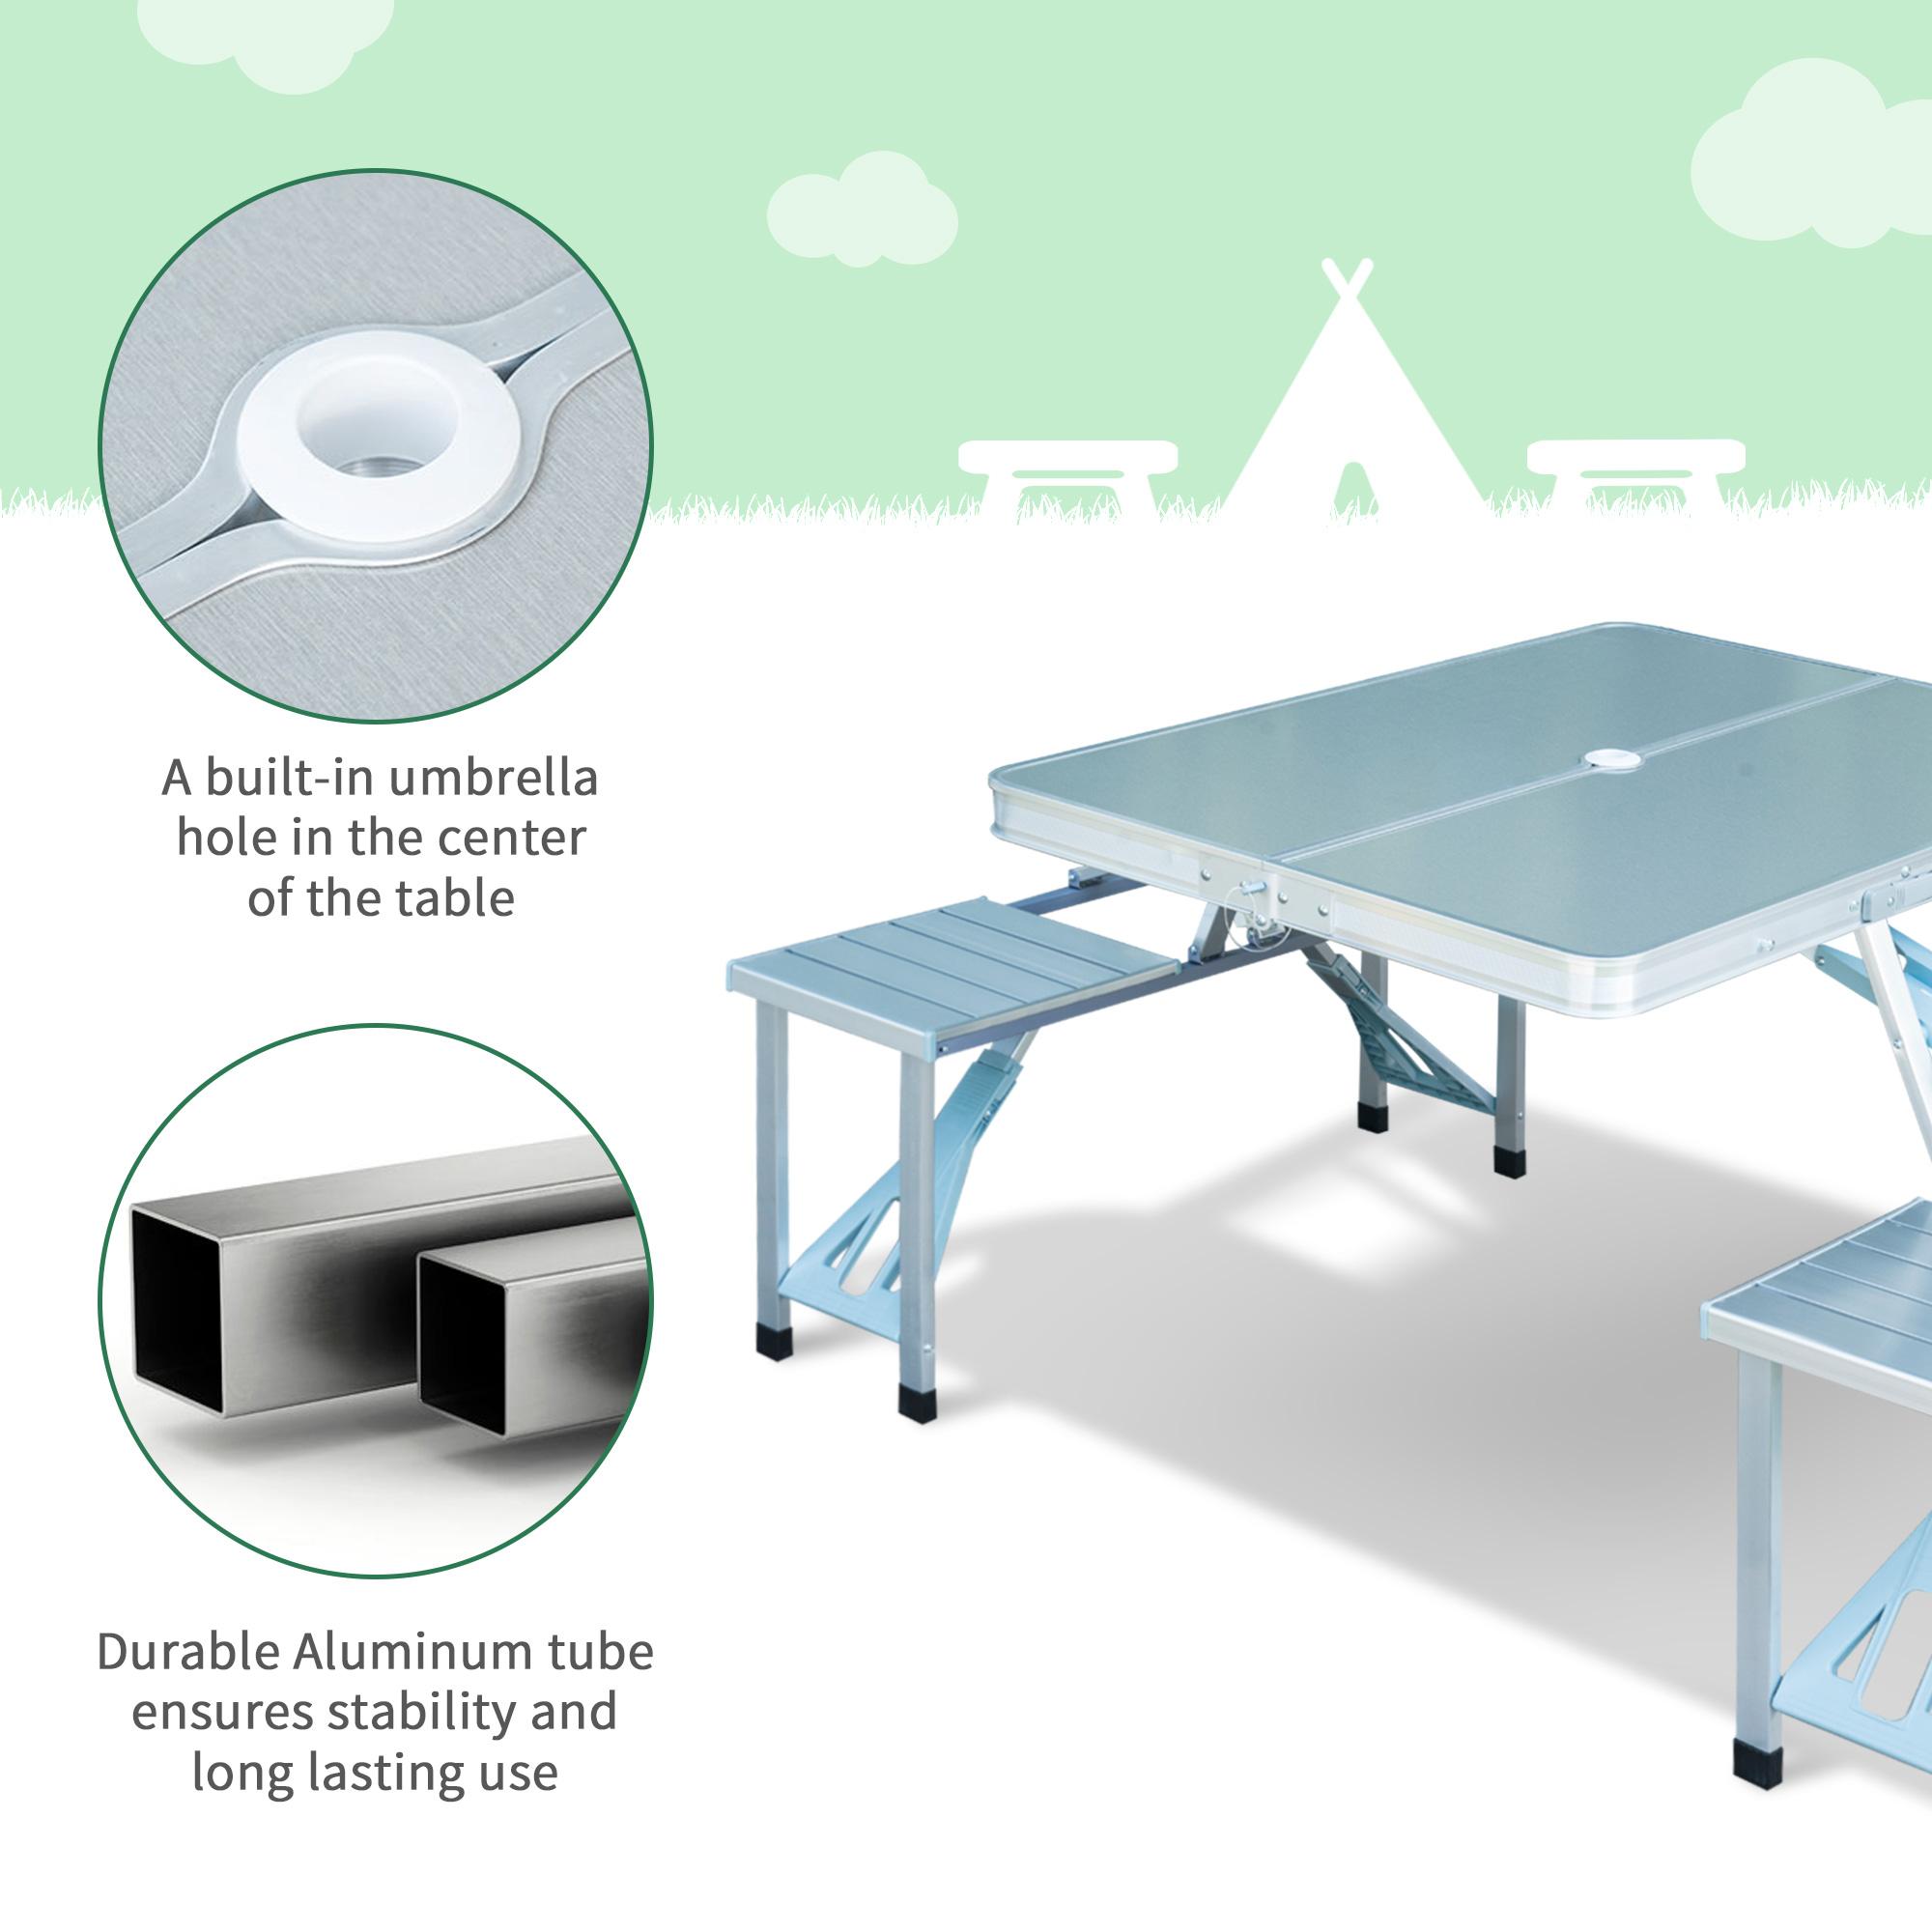 thumbnail 42 - Portable Folding Camping Picnic Table Party Outdoor Garden Chair Stools Set